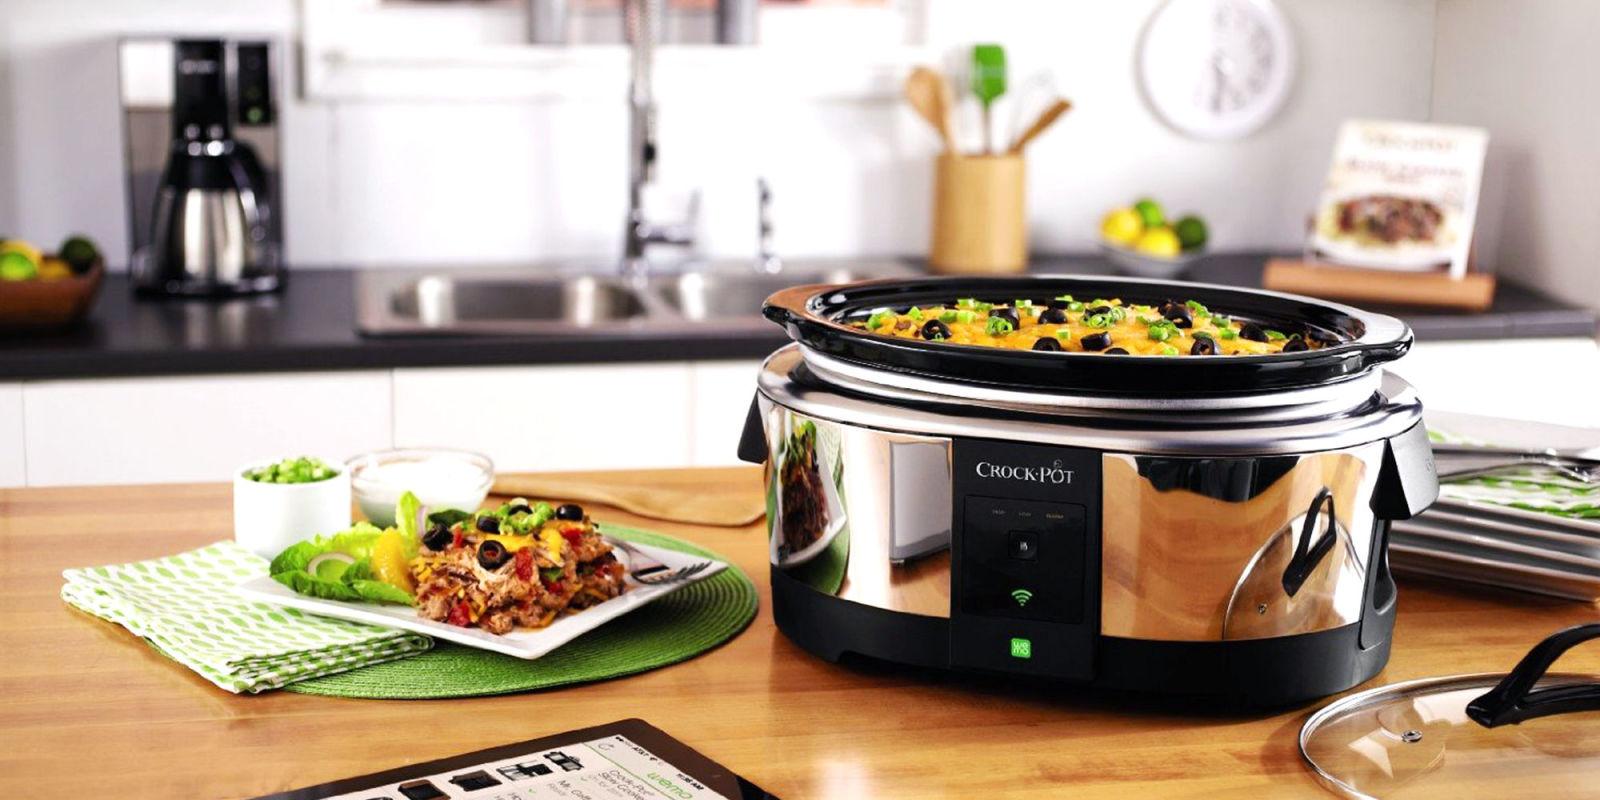 Uncategorized Coolest Kitchen Appliances 37 coolest kitchen gadgets in 2017 quirky tools we love small appliances